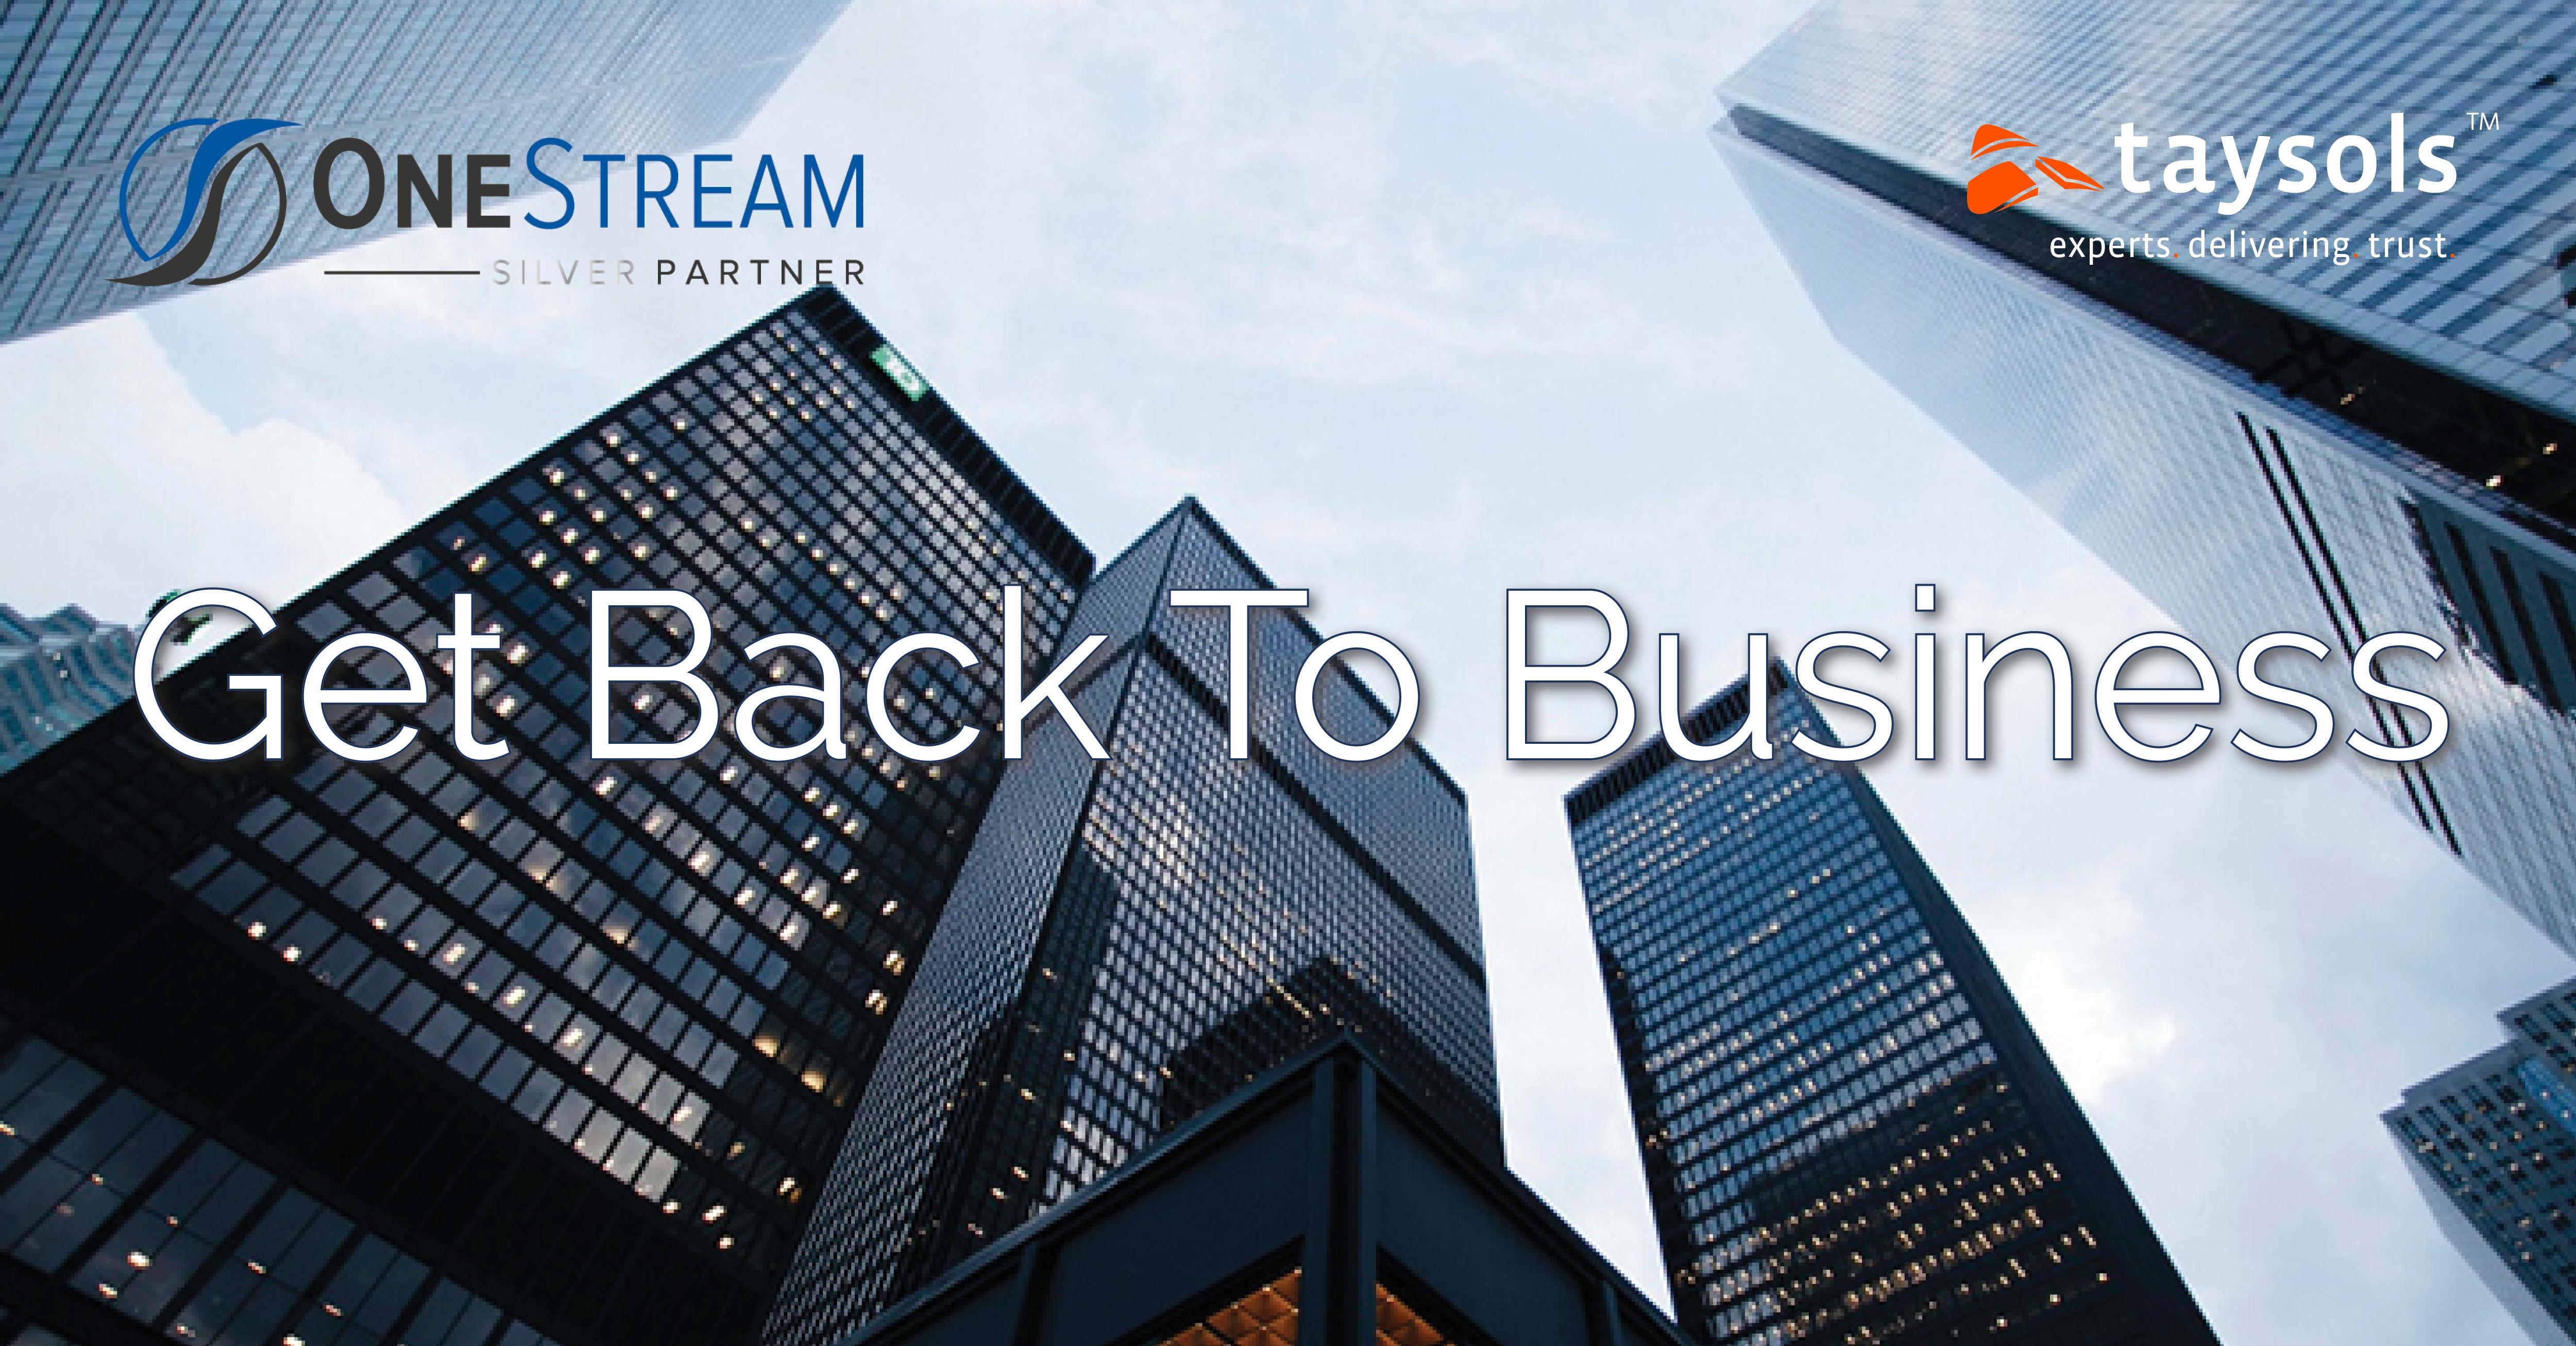 Taysols OneStream Australia - Get Back To Business